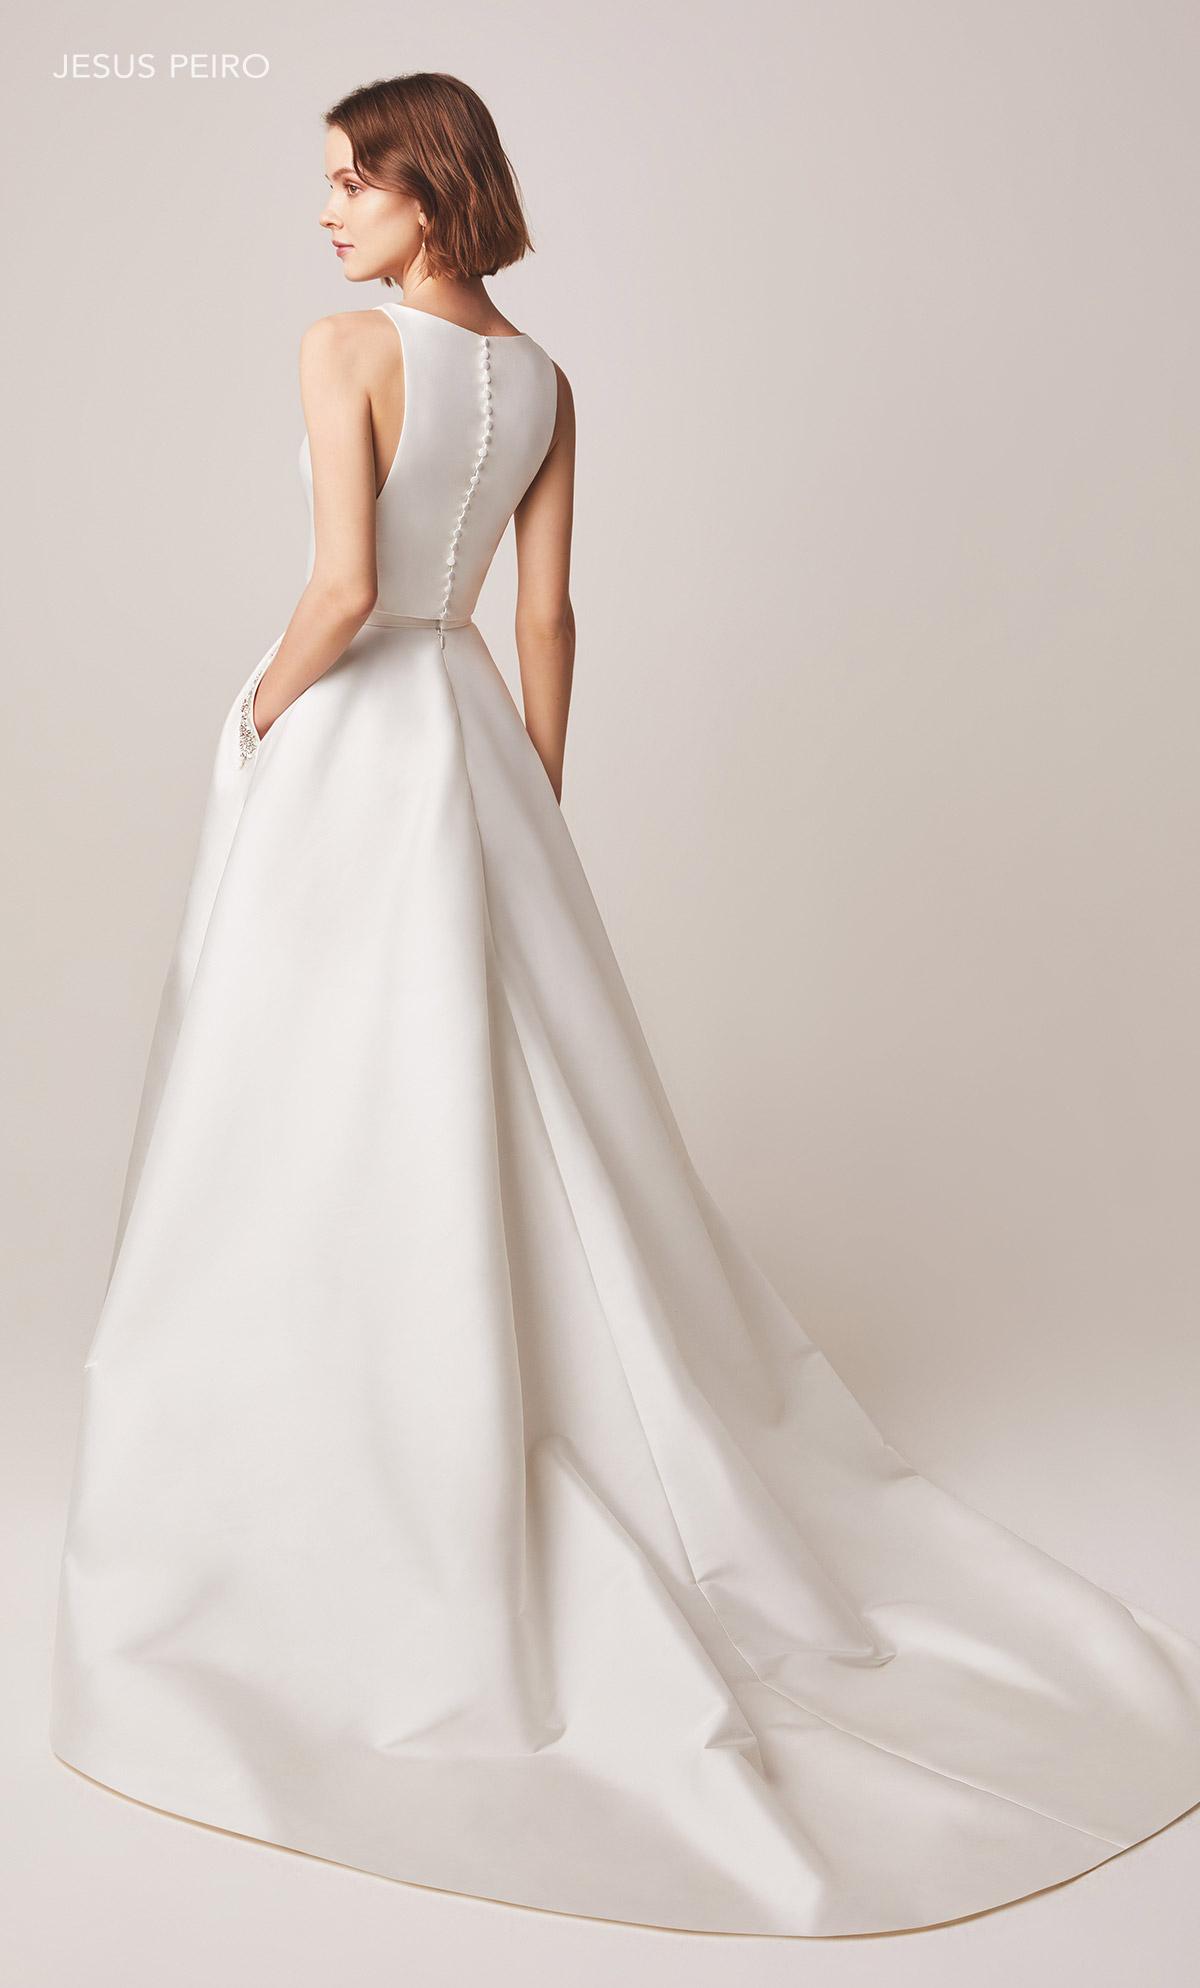 Vestido novia Jesús Peiró Ref.123